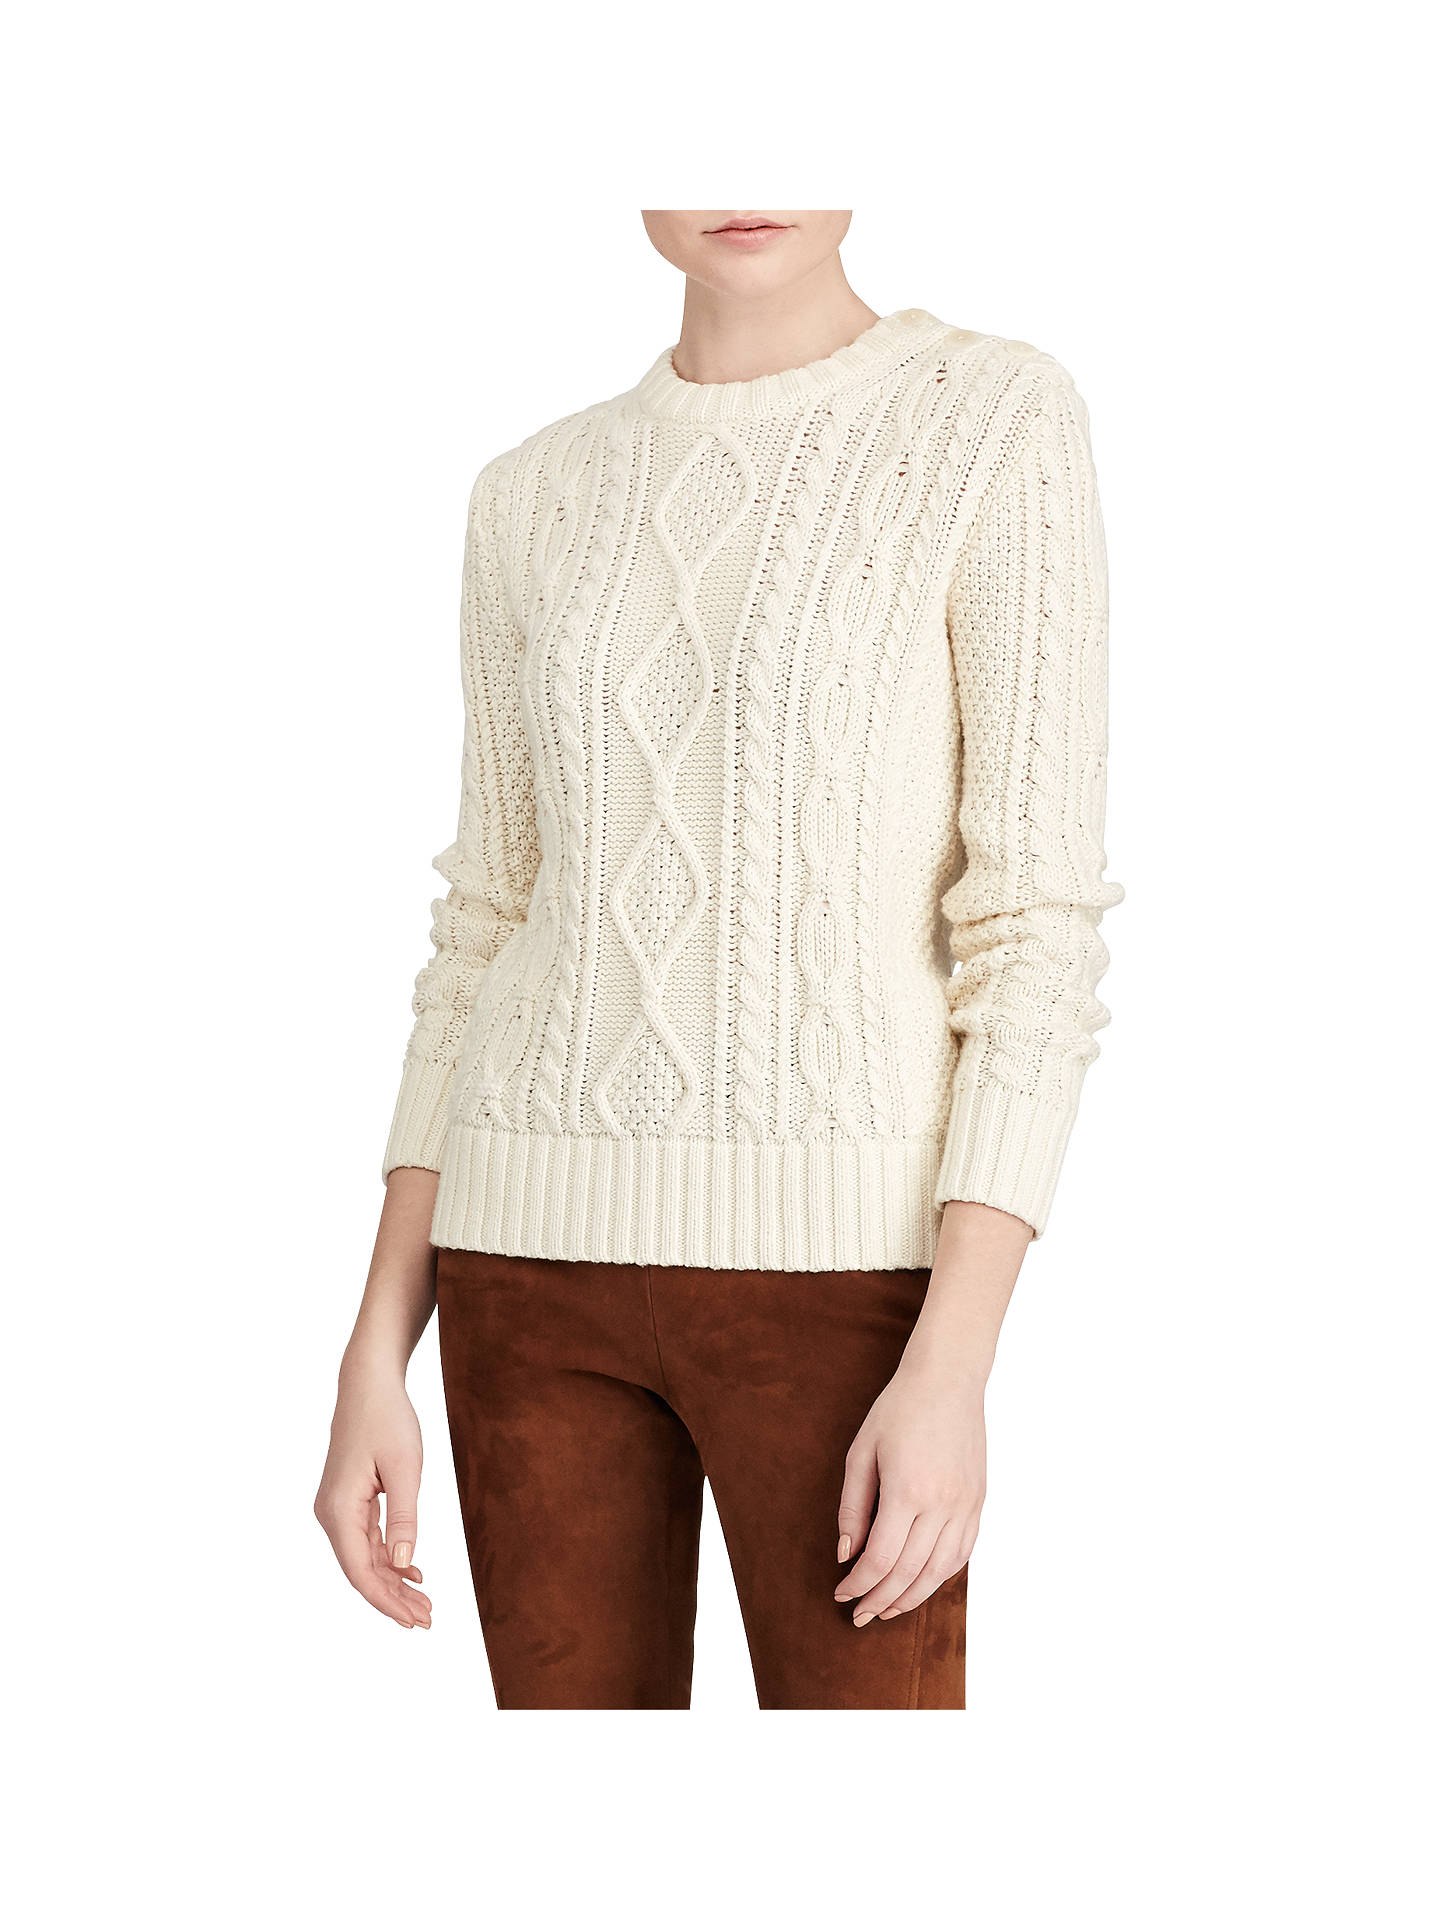 e92db97358 Polo Ralph Lauren Aran Knit Sweater, Cream at John Lewis & Partners